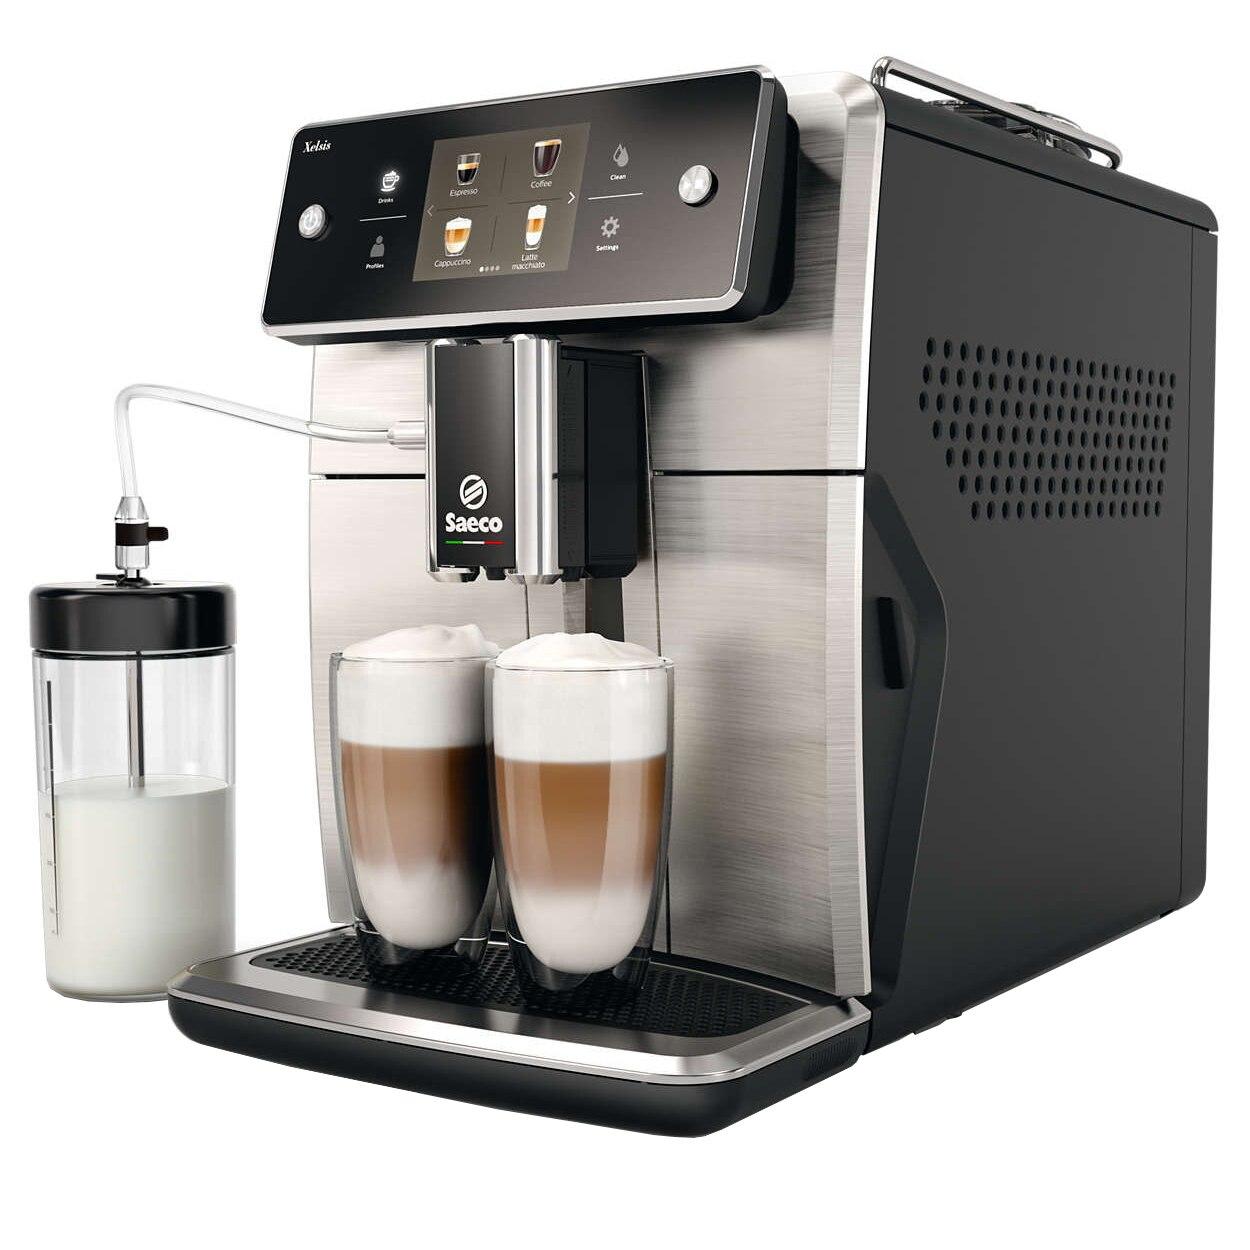 Fotografie Espressor automat Saeco Xelsis SM7683/00, Ecran tactil cu Coffee Equalizer, Sistem Latteduo, 15 selectii , 6 profiluri, Rasnita ceramica cu 12 trepte, AquaClean, Negru/Inox